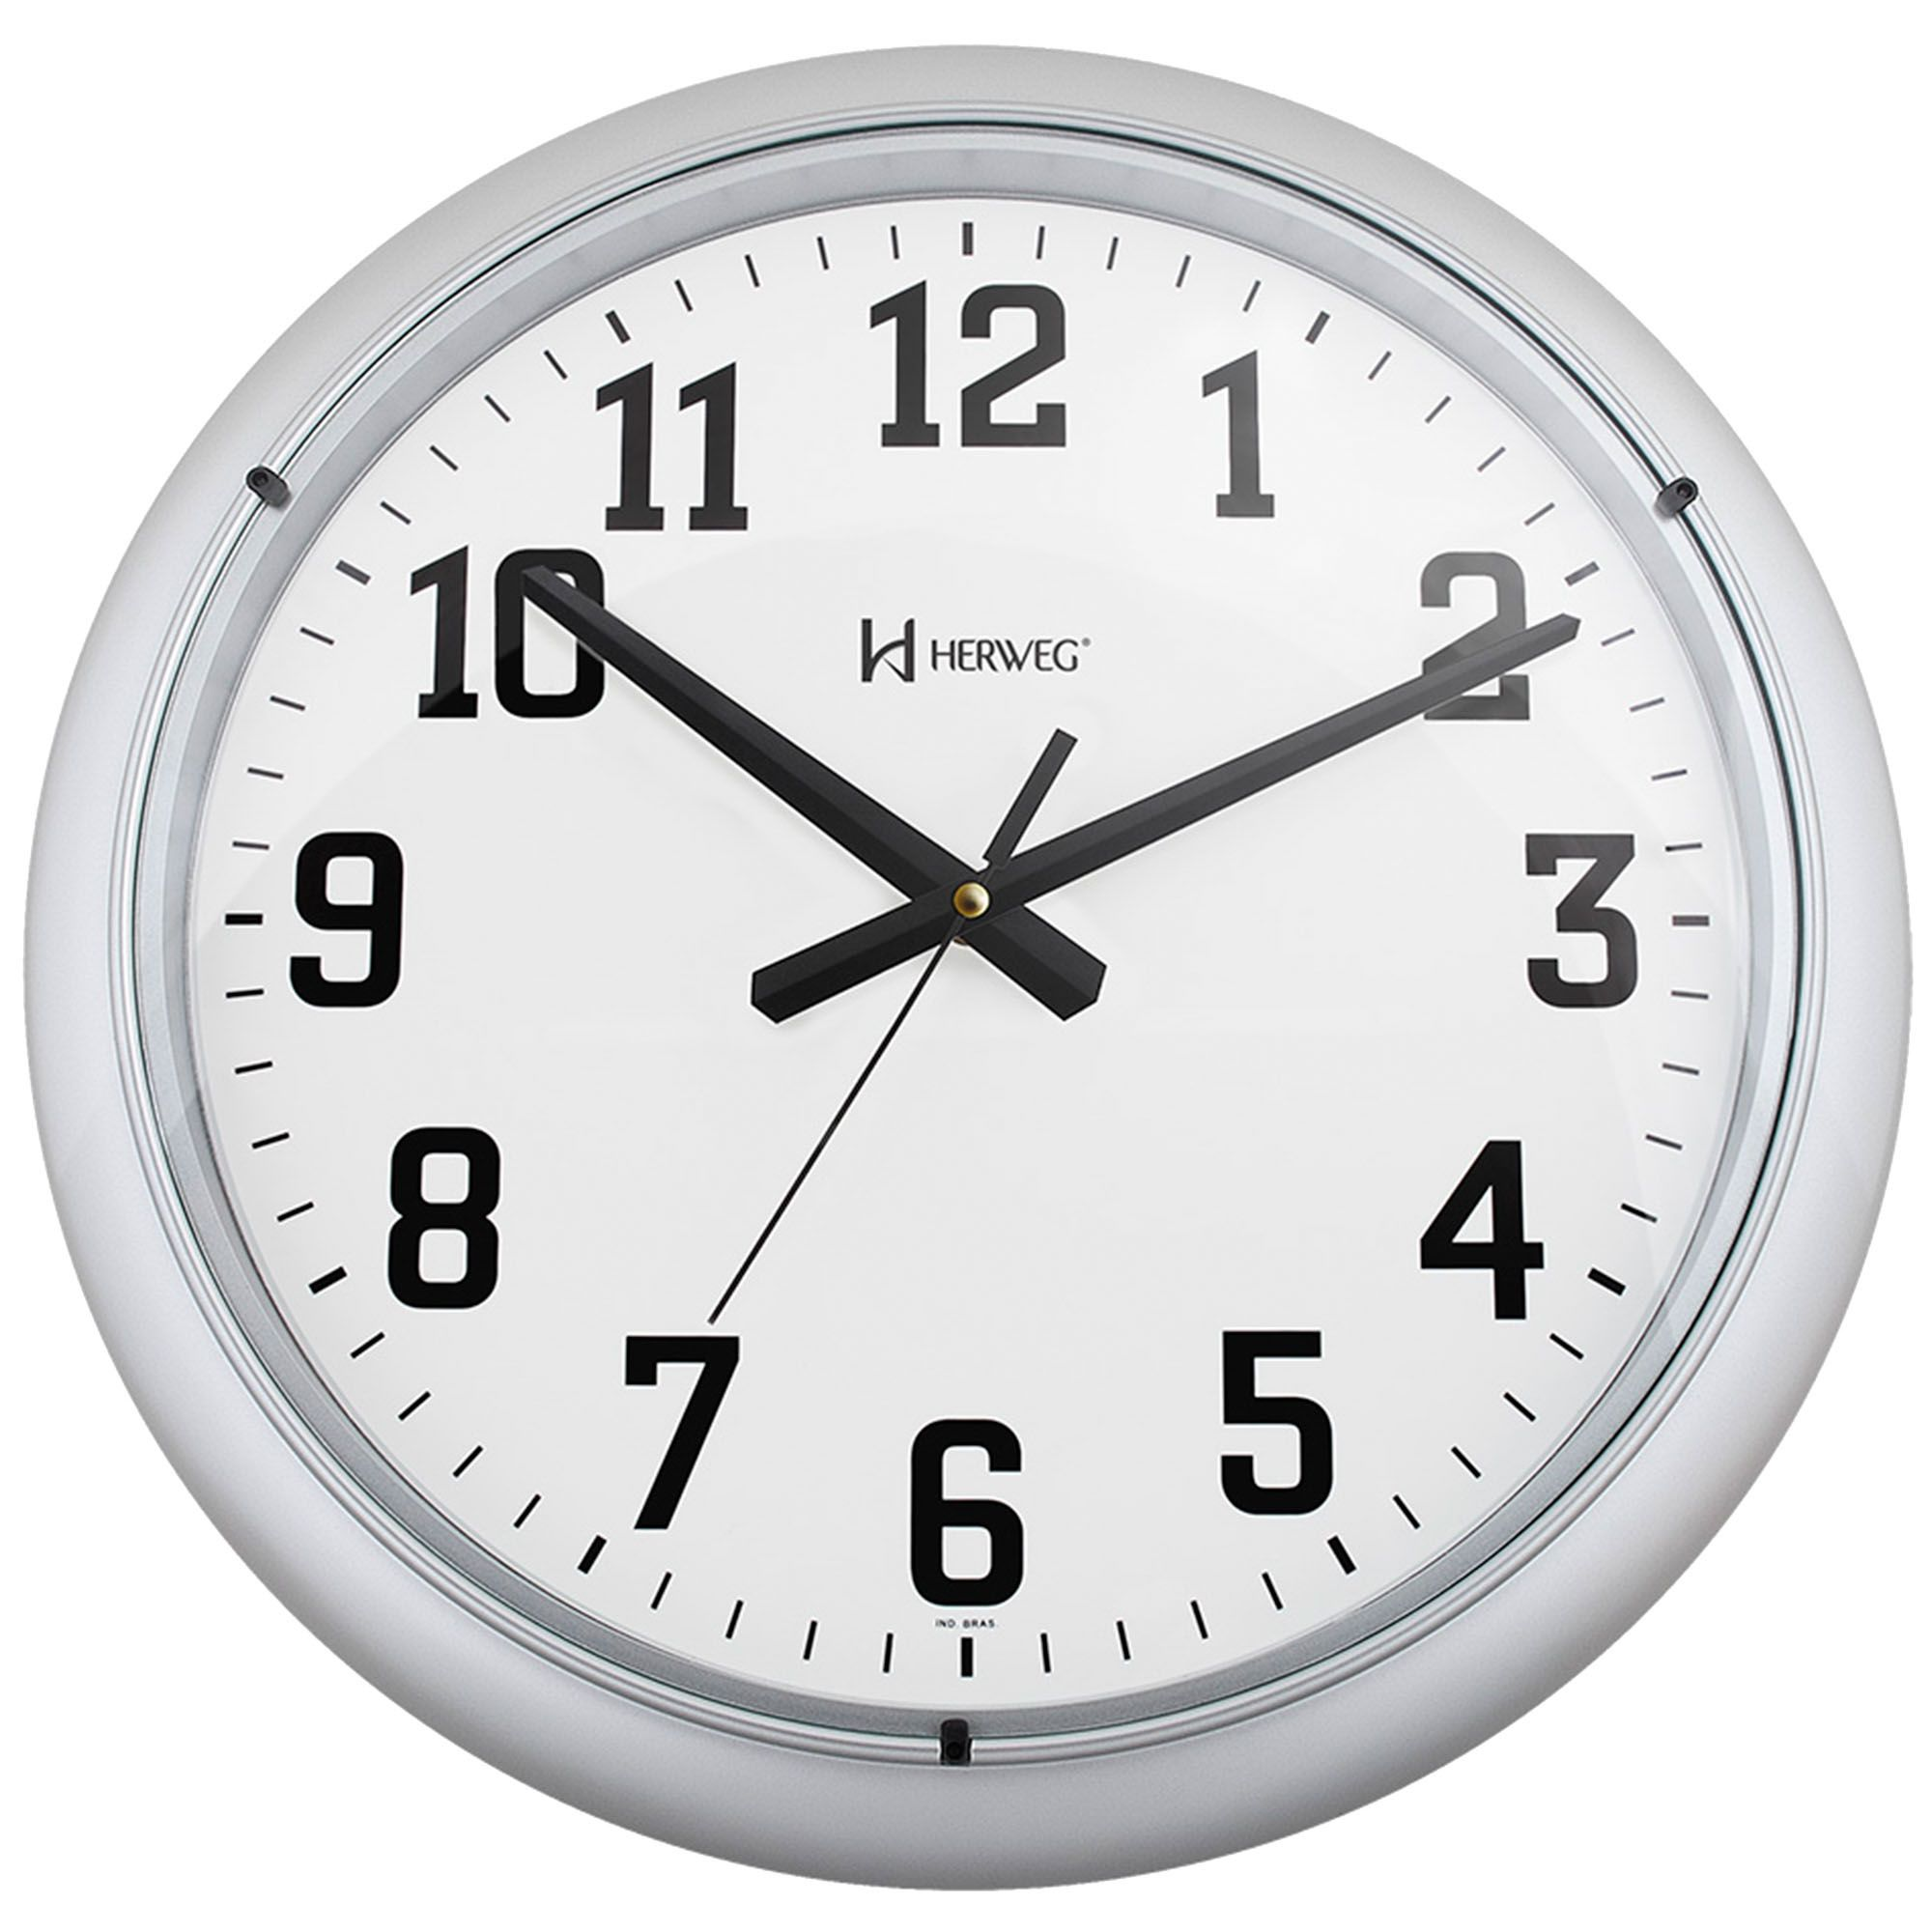 Relógio de Parede Analógico Herweg 6129 070 Prata Metálico